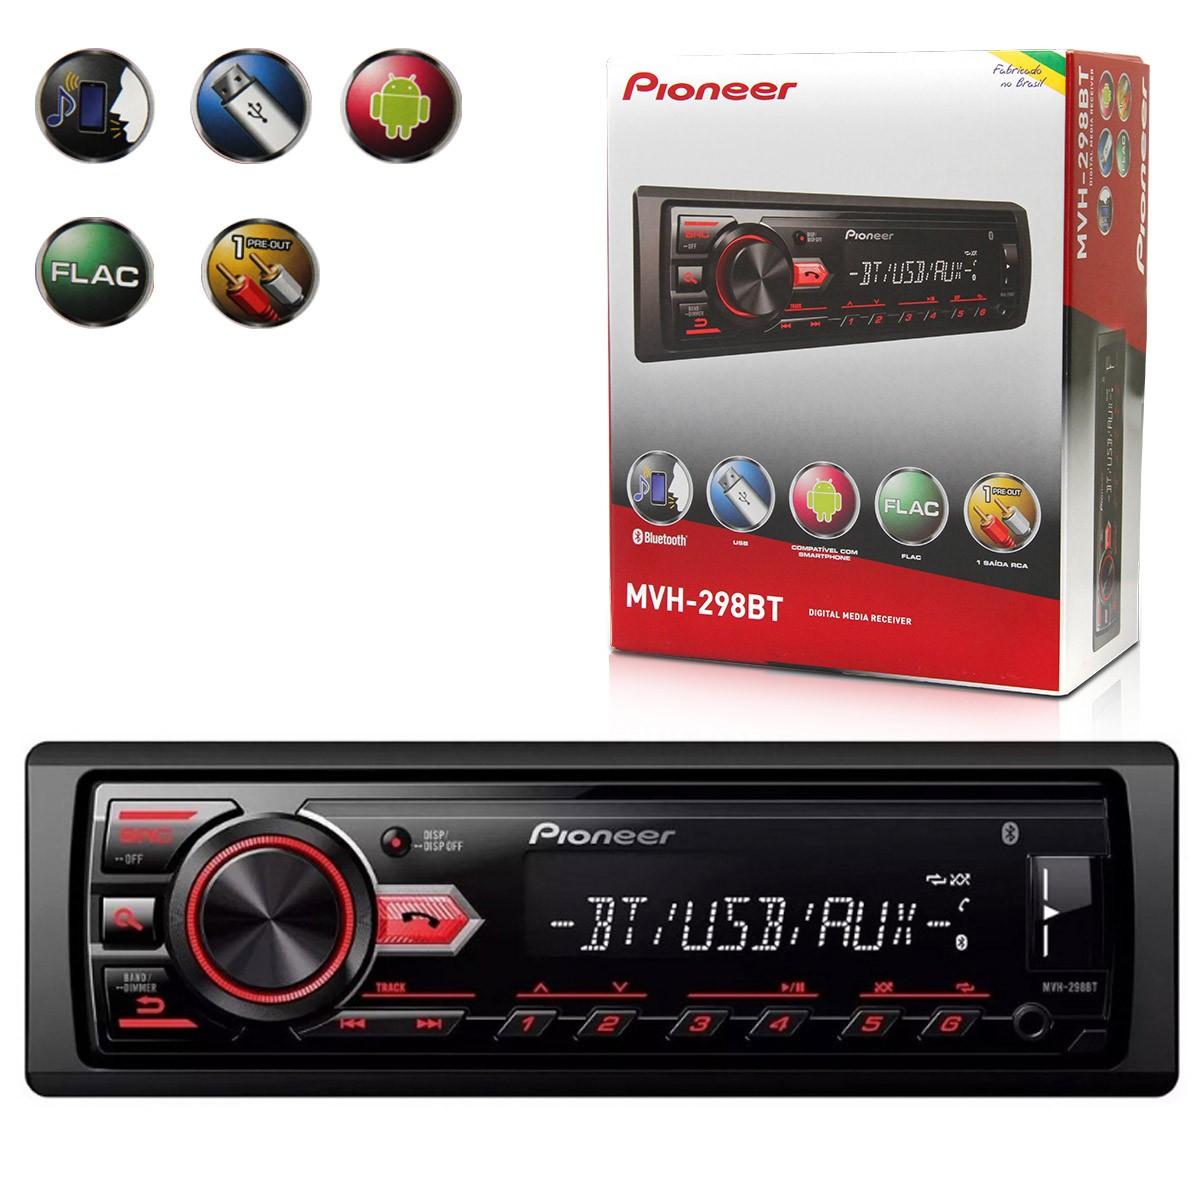 Auto Rádio Pioneer MVH-298BT